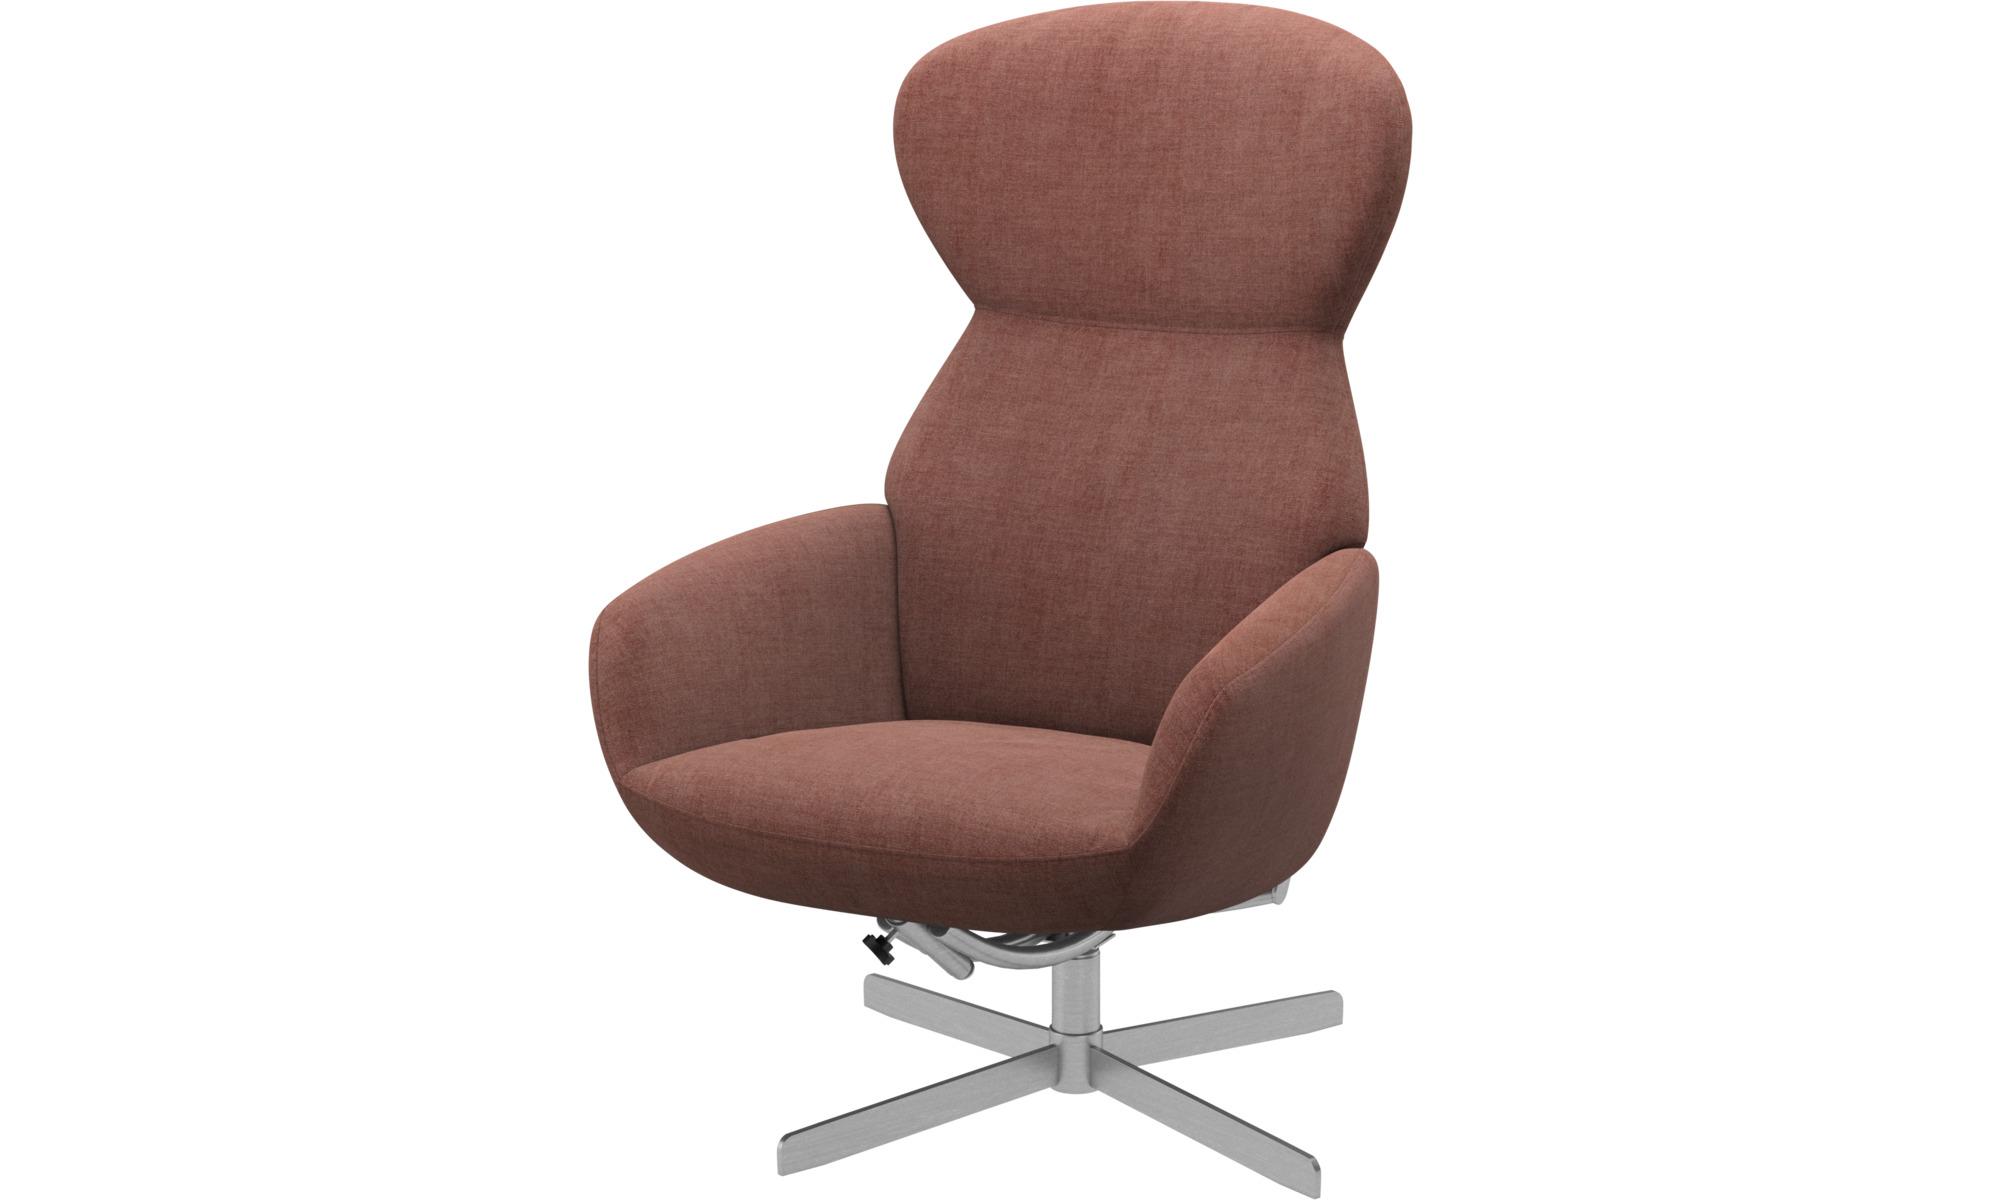 【Chair】Athene arm chair 45%off